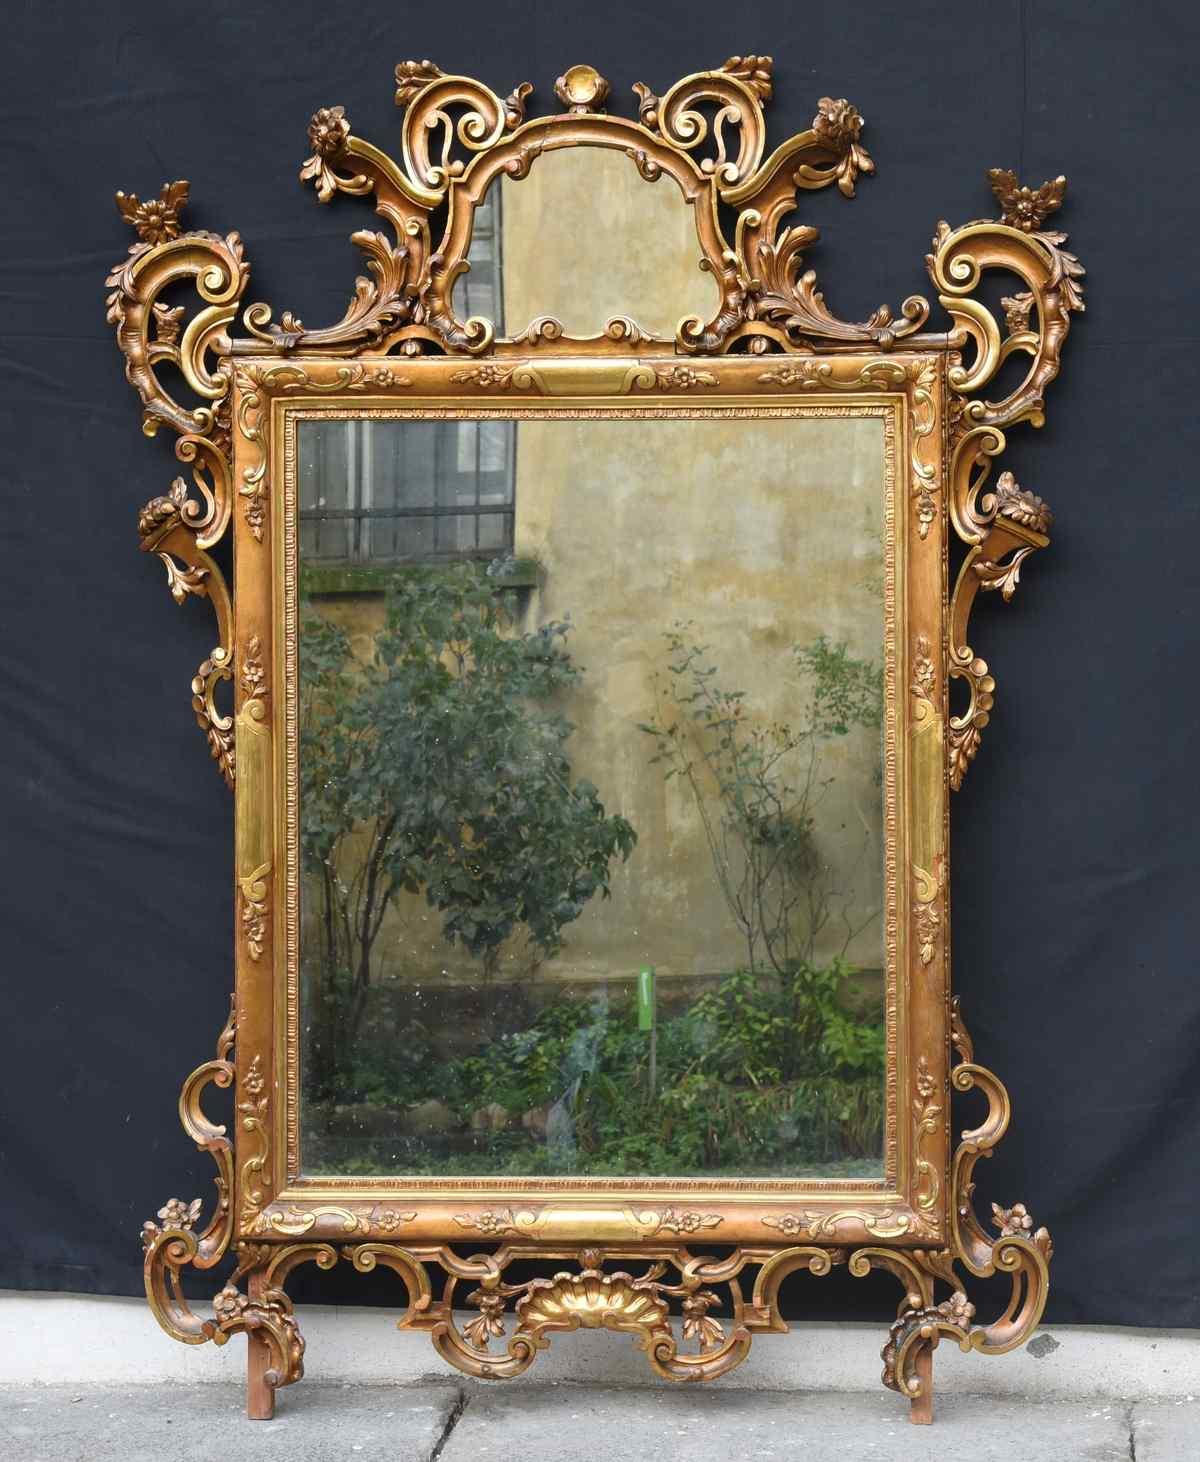 Antique 20th century mirror in Louis XVI style